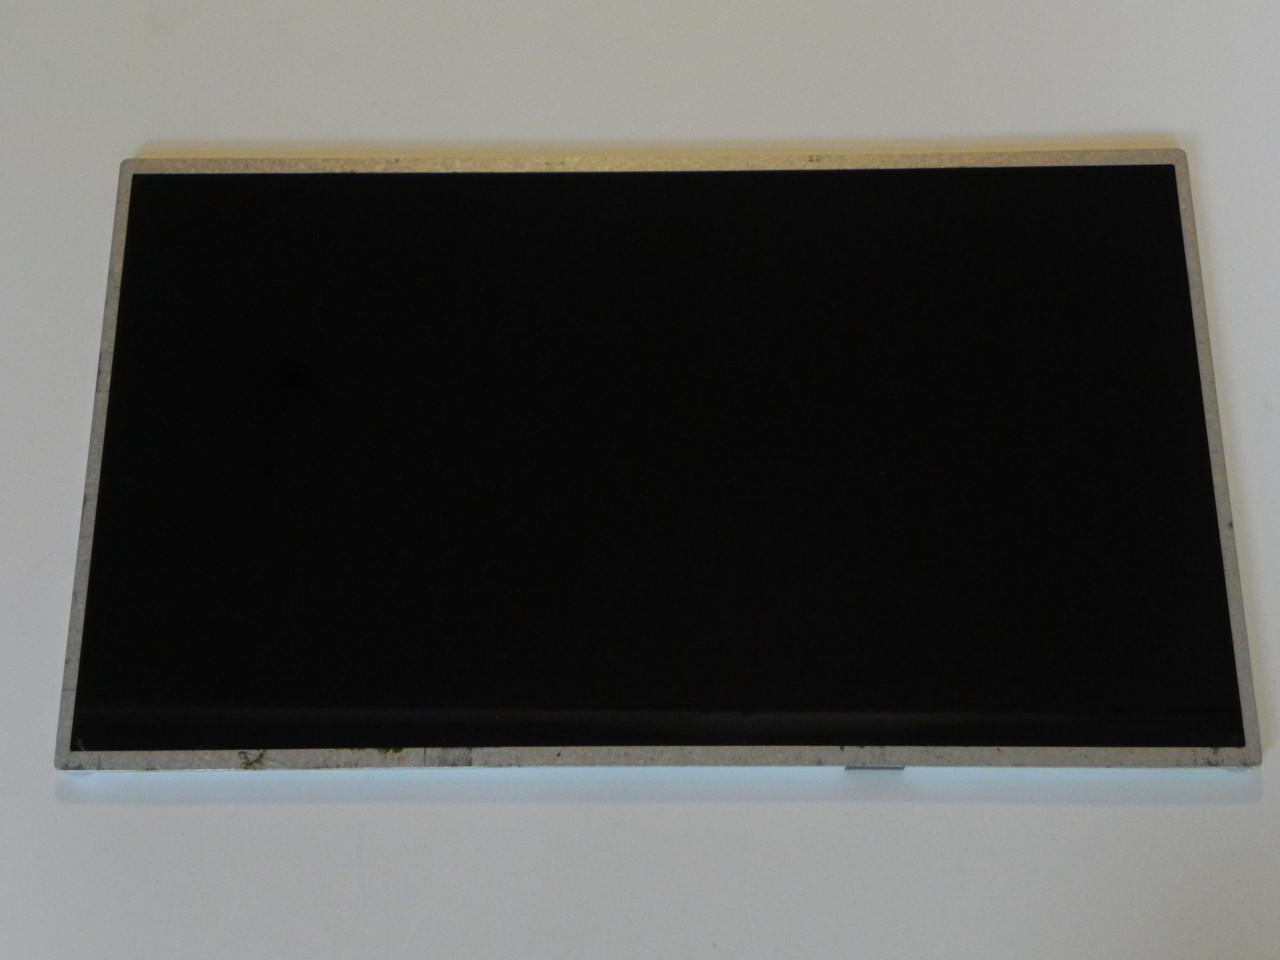 Екран матриця LP156WH4 TL A1, LP156WH4 (TL) (A1) БО